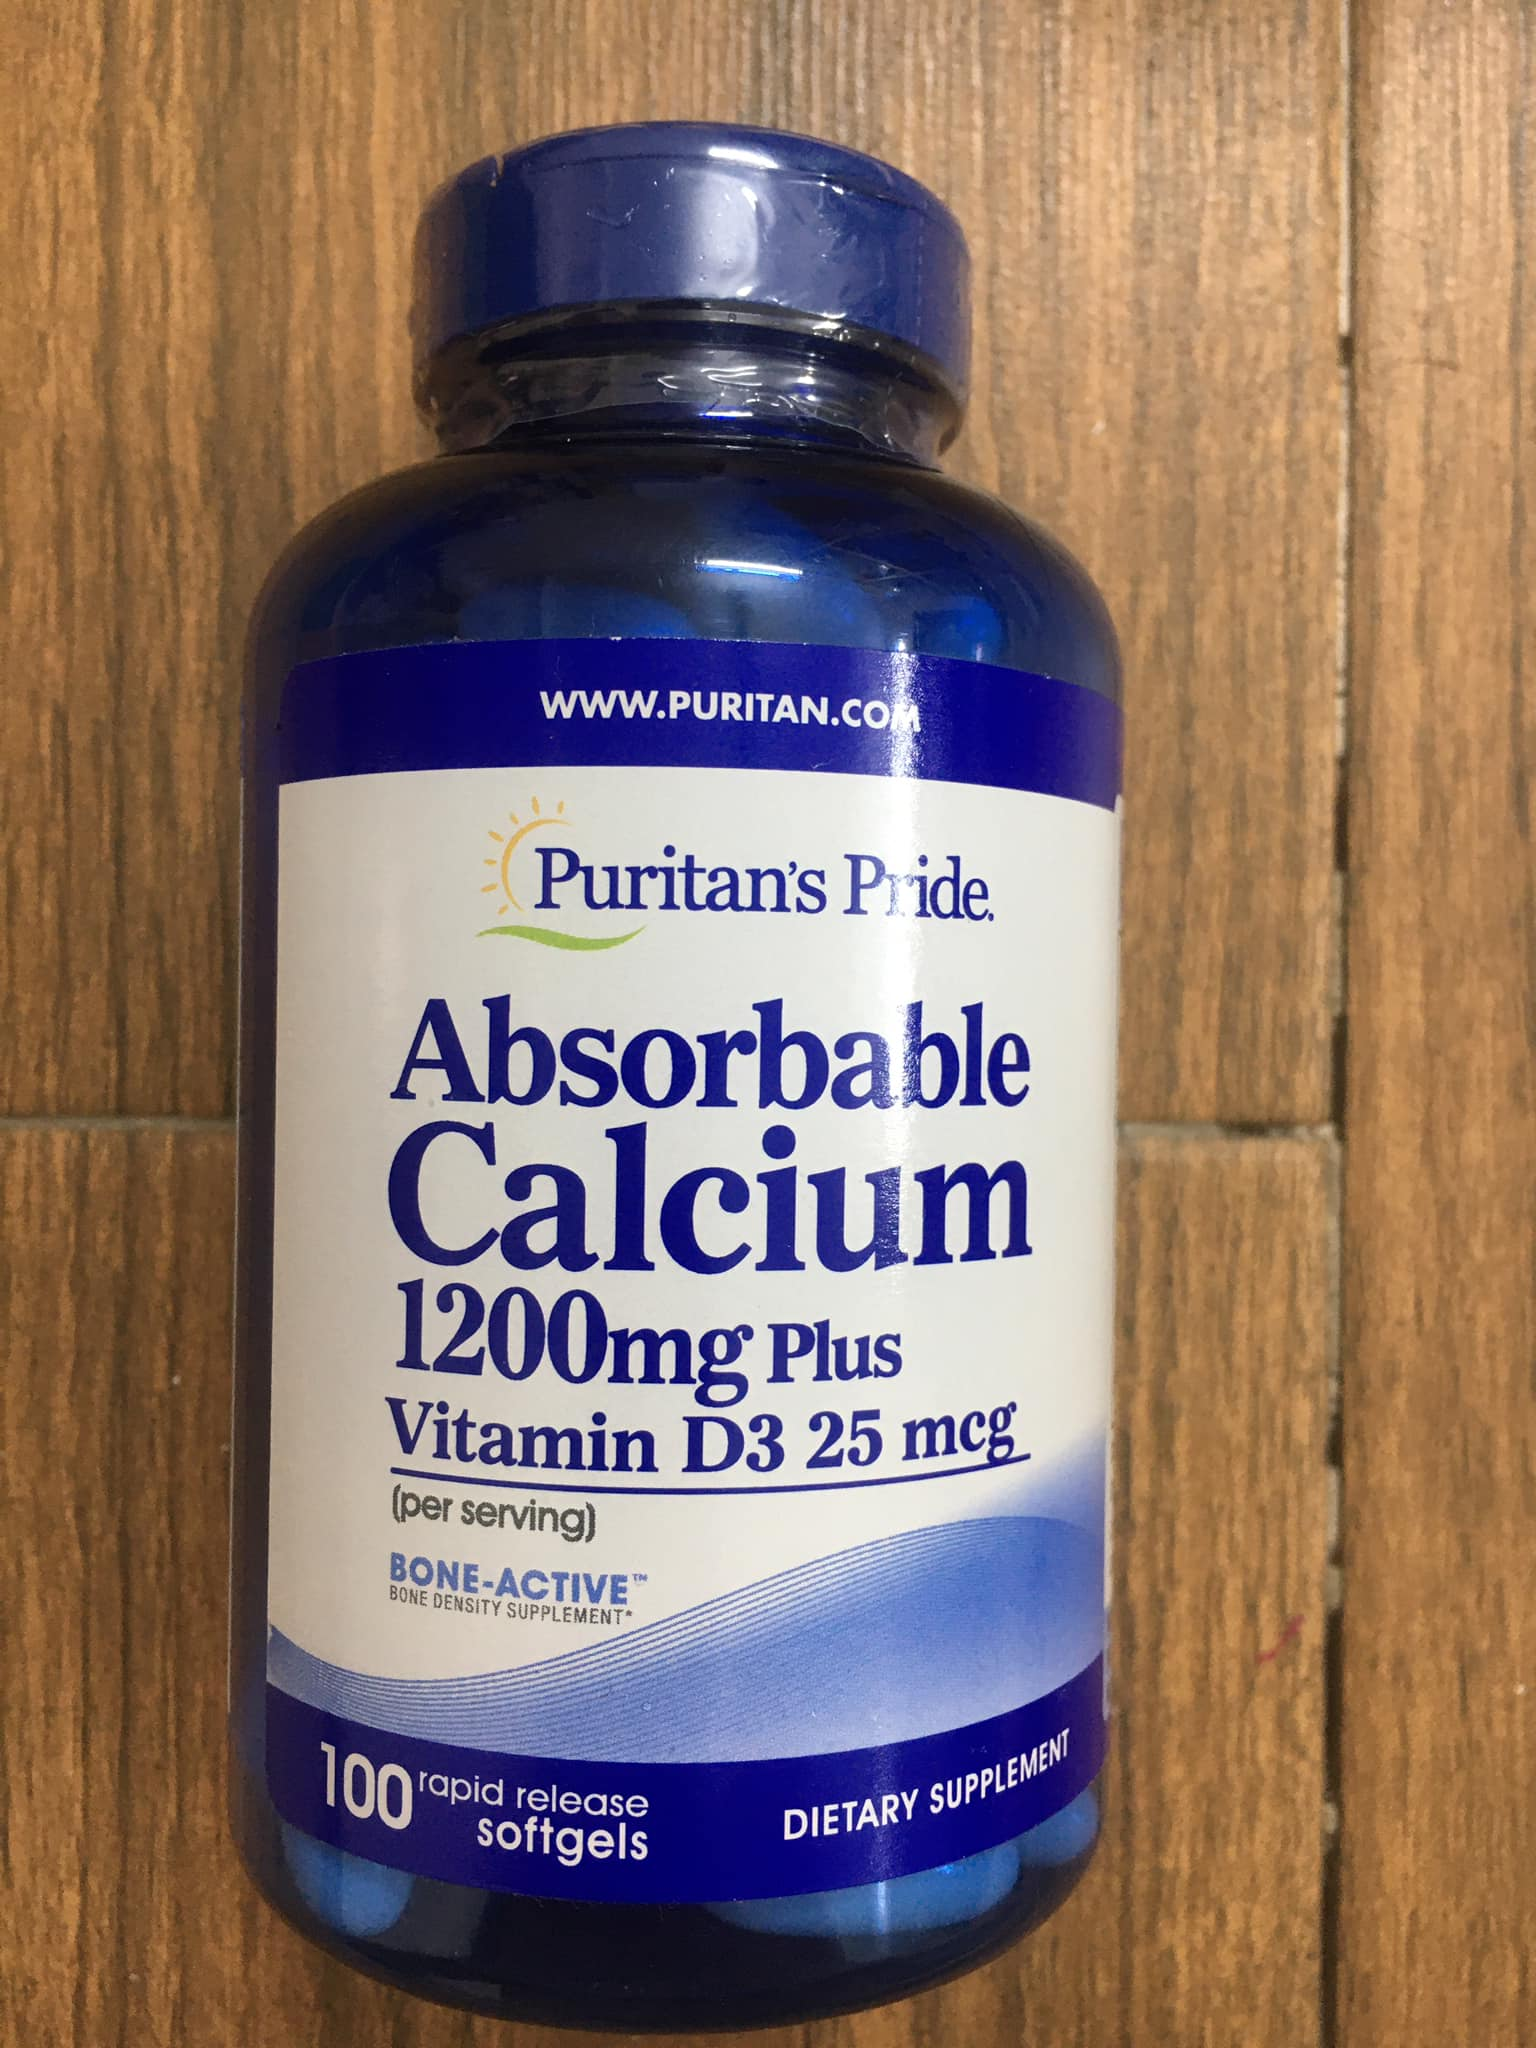 Absorbable Calcium 1200mg Plus Vitamin D3 25mcg